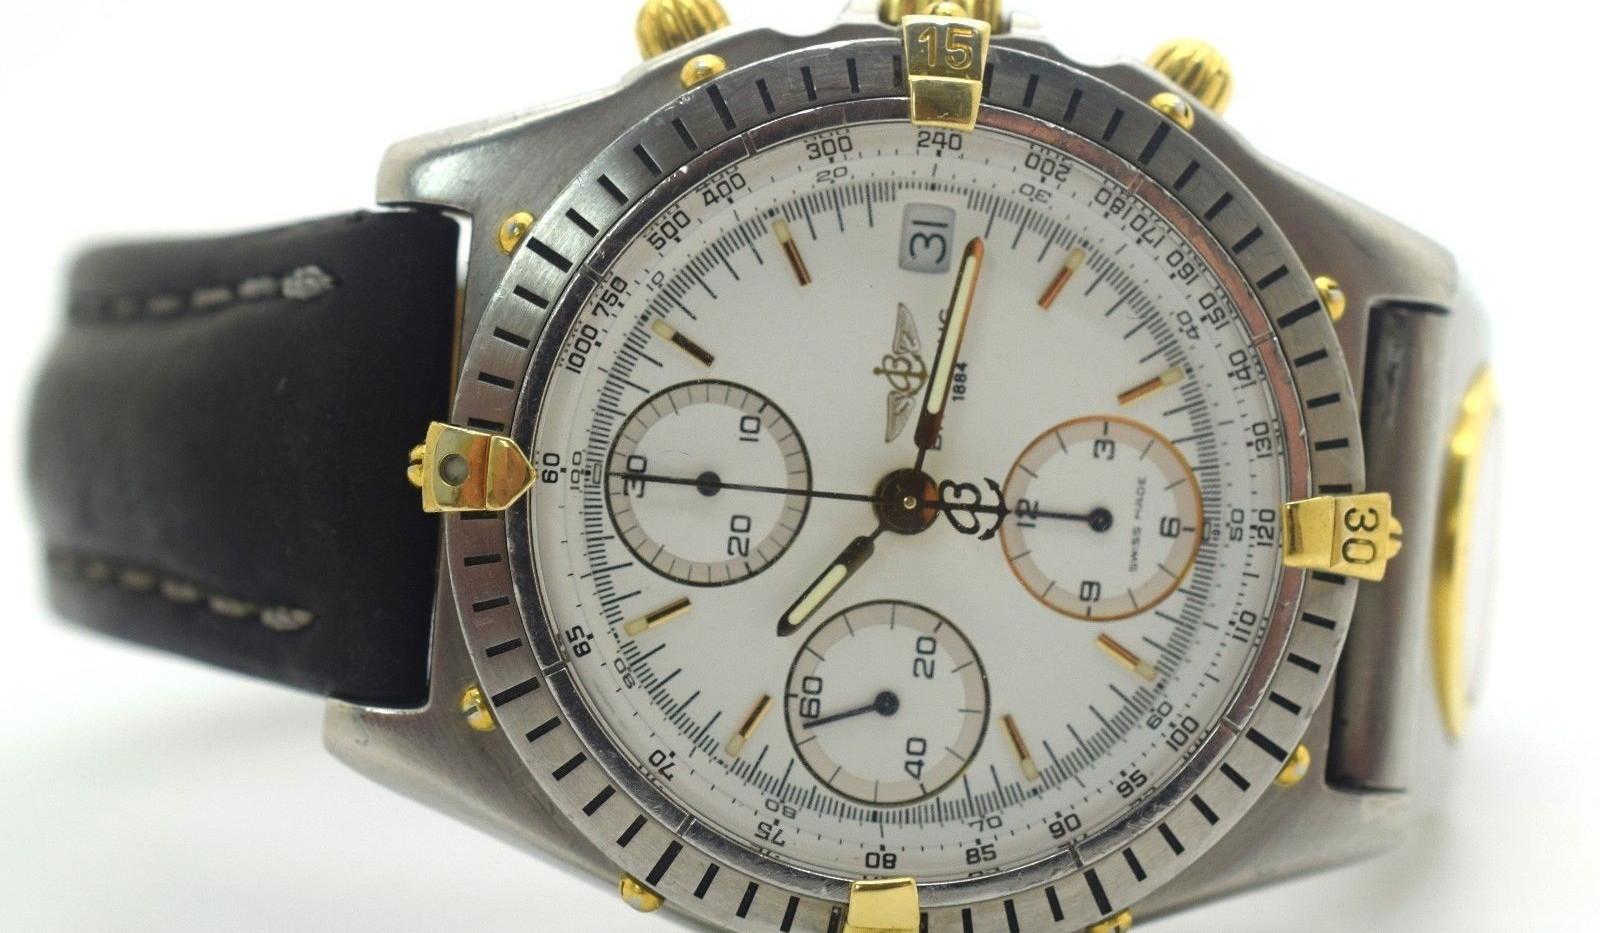 Breitling Chronomat Automatic Chronometer White Dial Dual Time Watch B13047